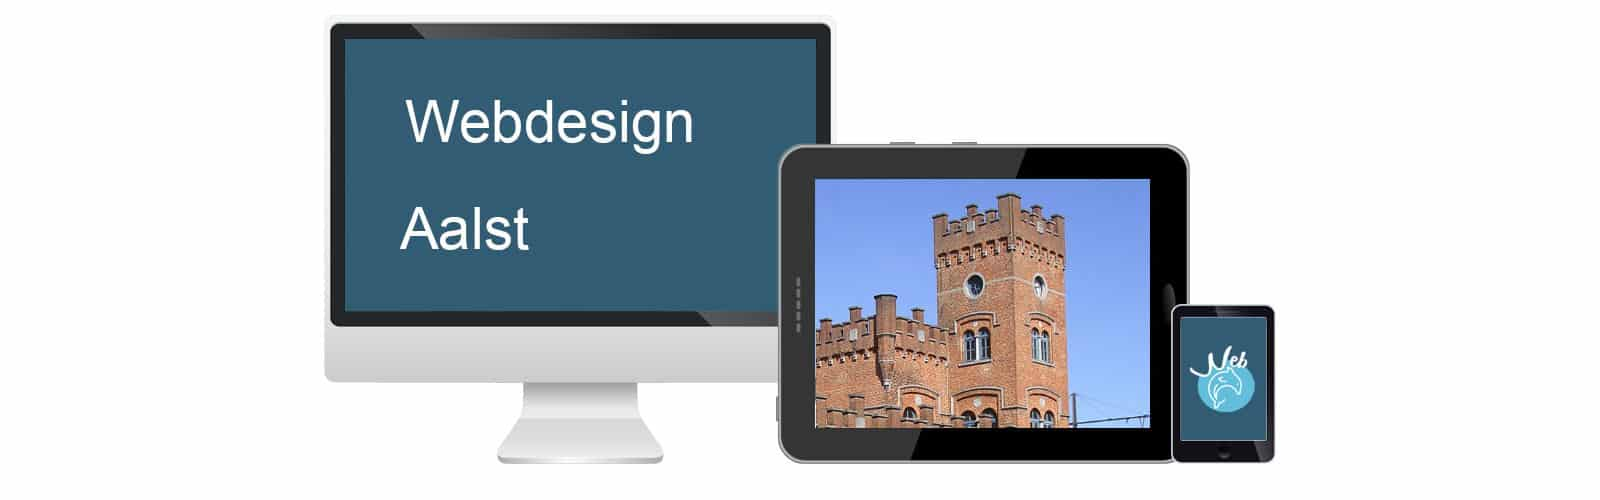 Webdesign Aalst - webdolfijn